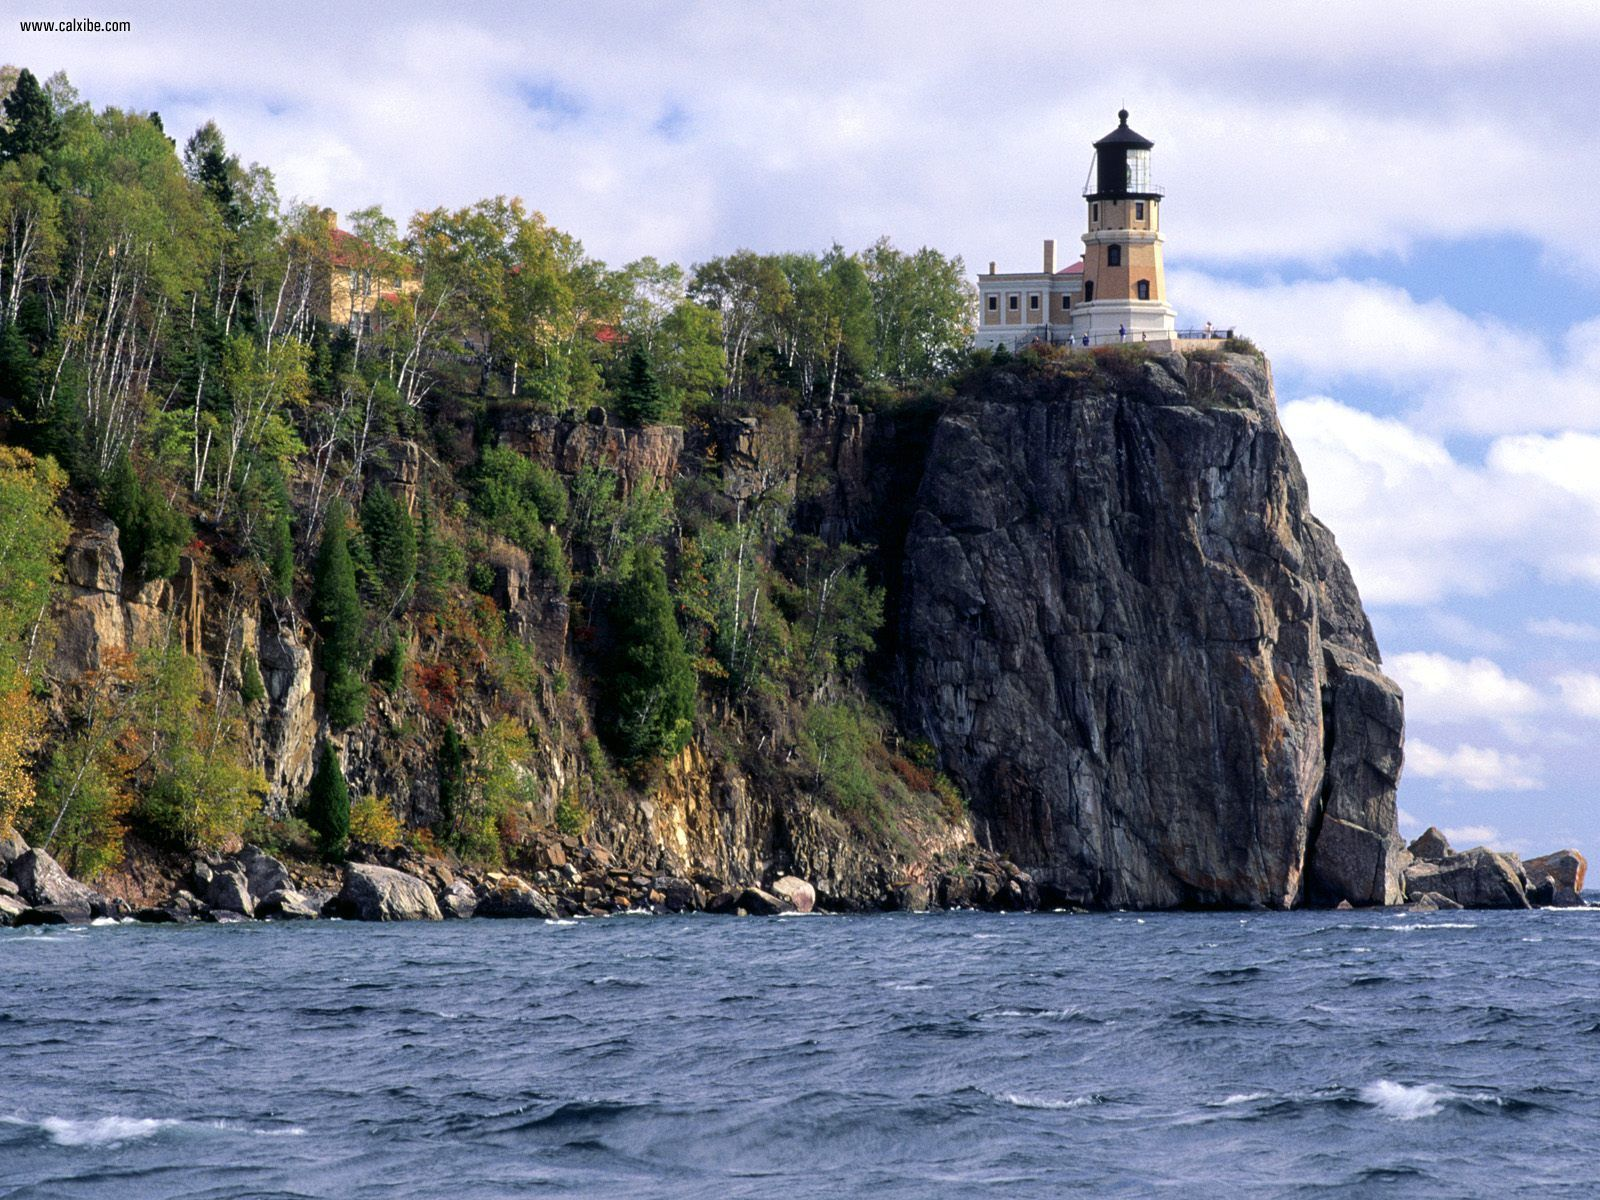 split-rock-lighthouse-from-a-distance